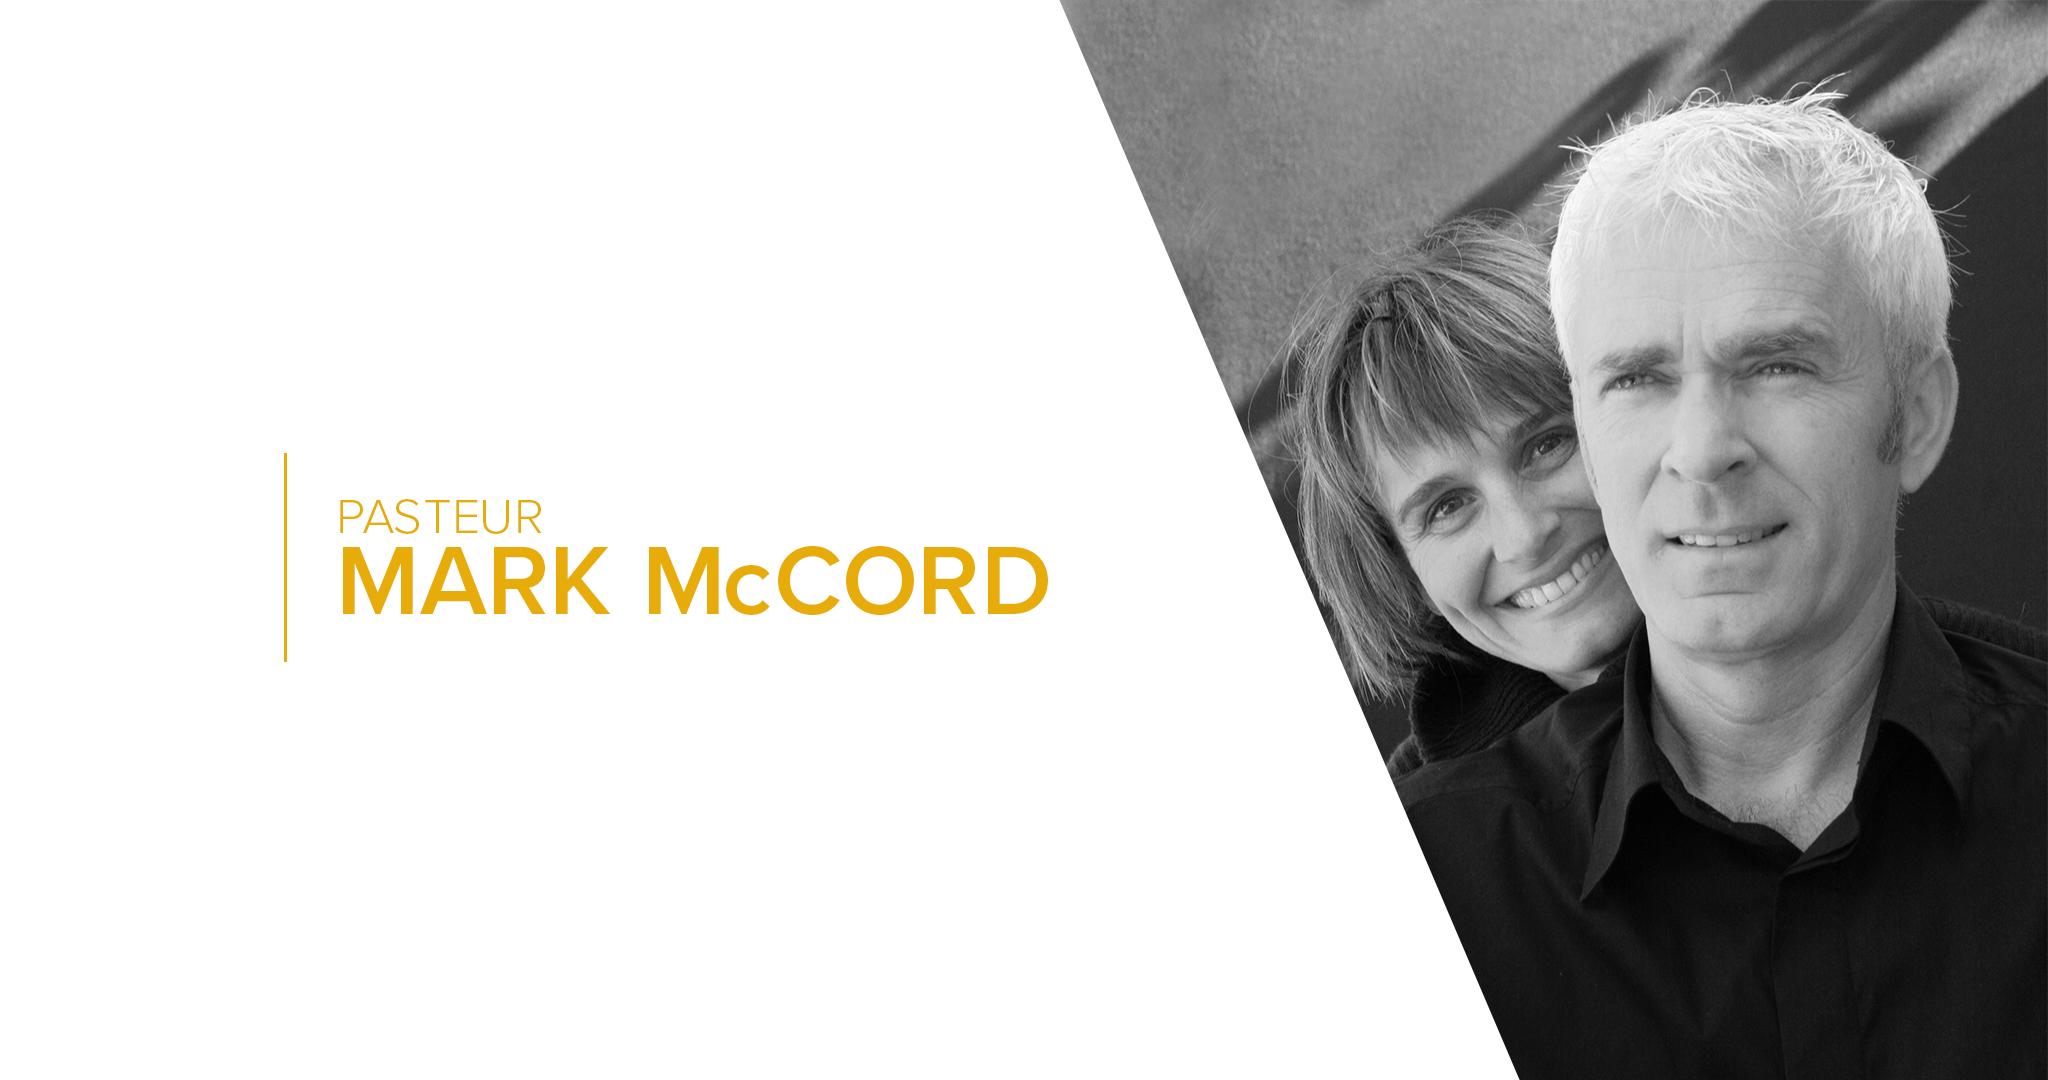 2018-11-11_LVC_Invité - Mark McCord_V3.jpg